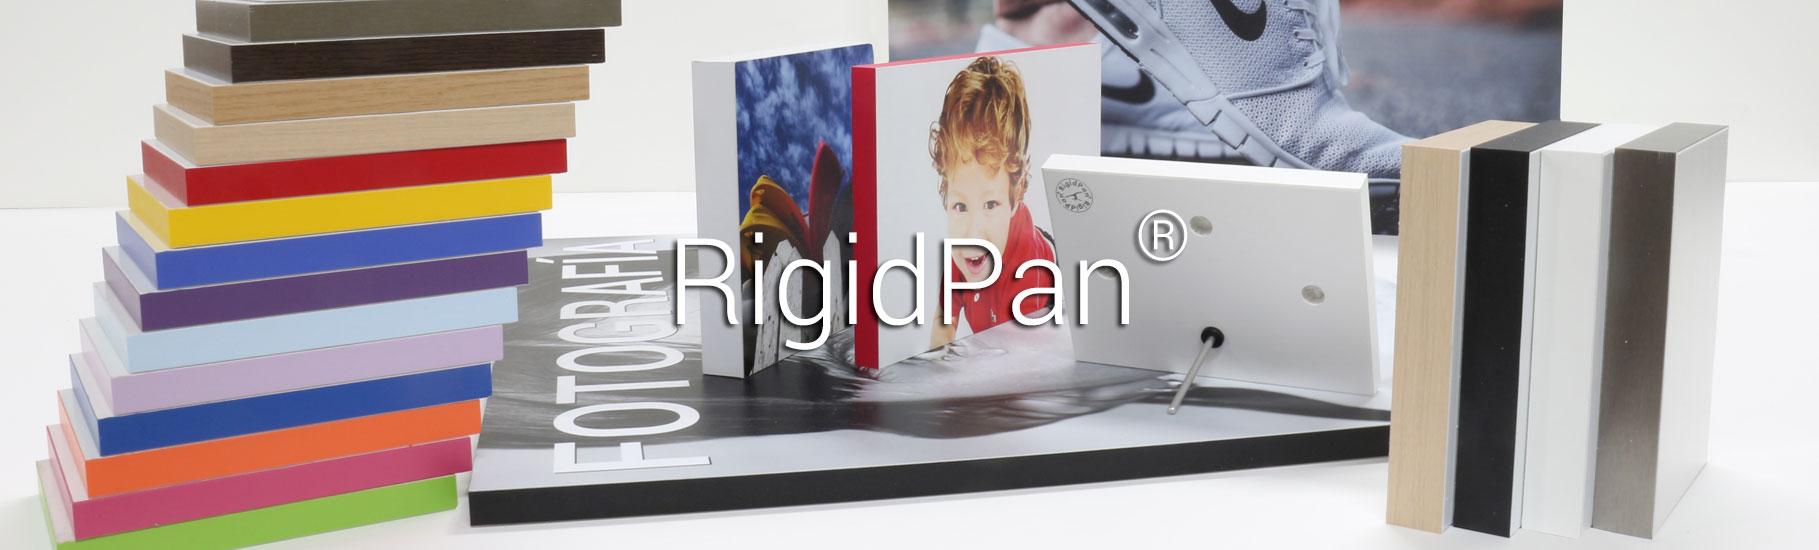 5.RigidPan